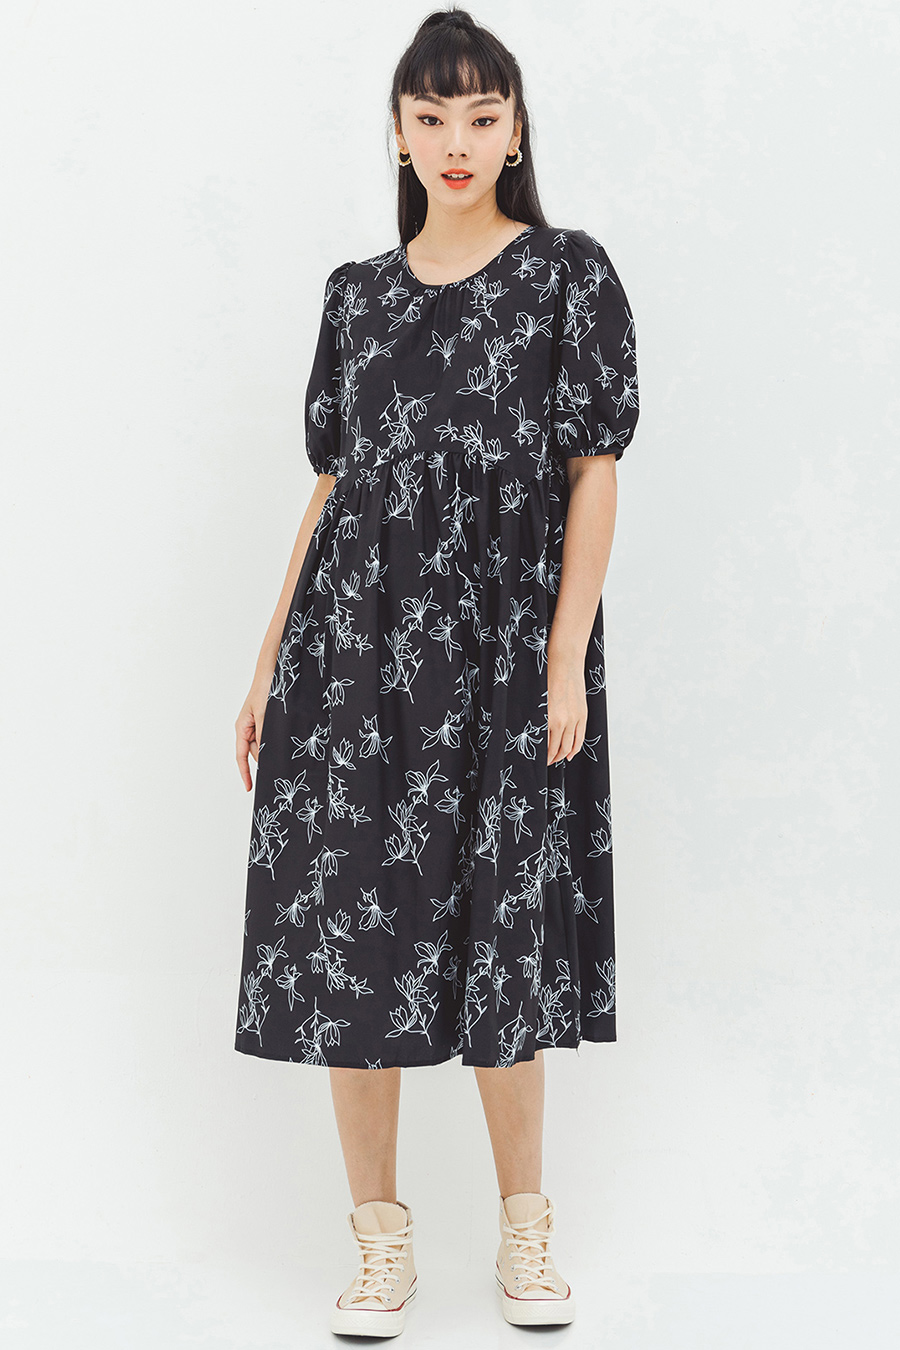 ANDREE DRESS - NOIR FLEUR